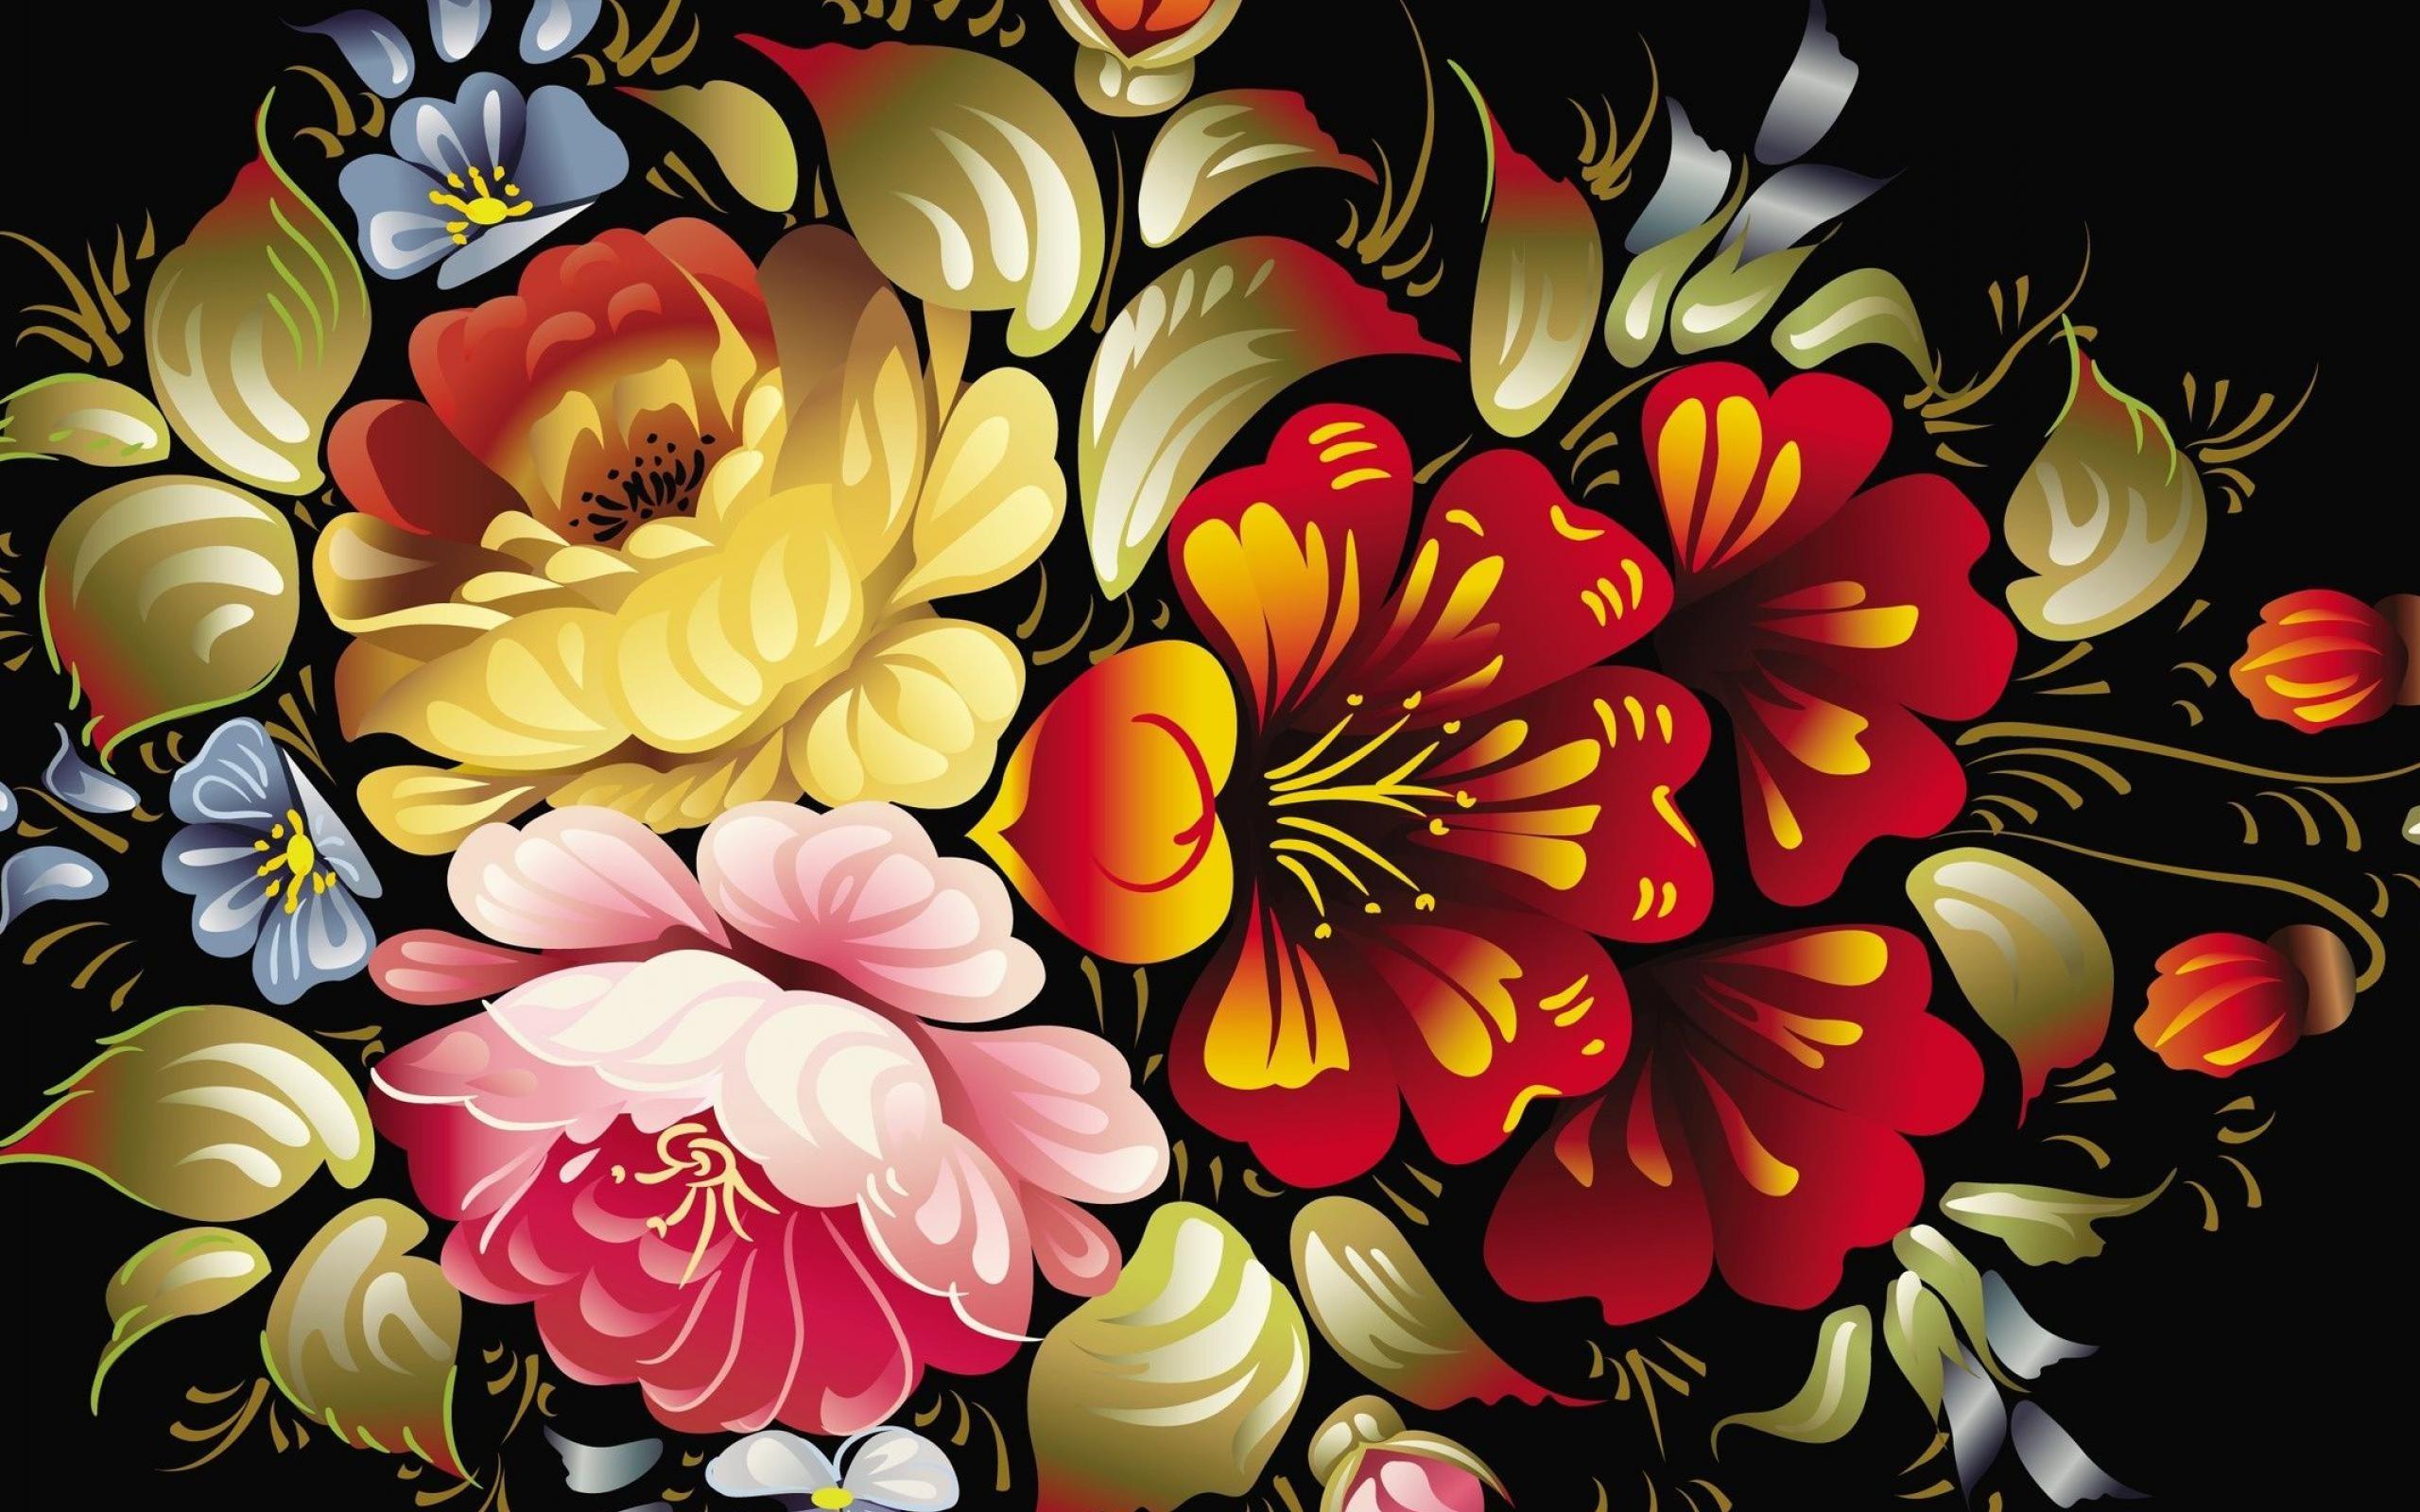 50 Free 3d Colorful Flowers Wallpaper On Wallpapersafari